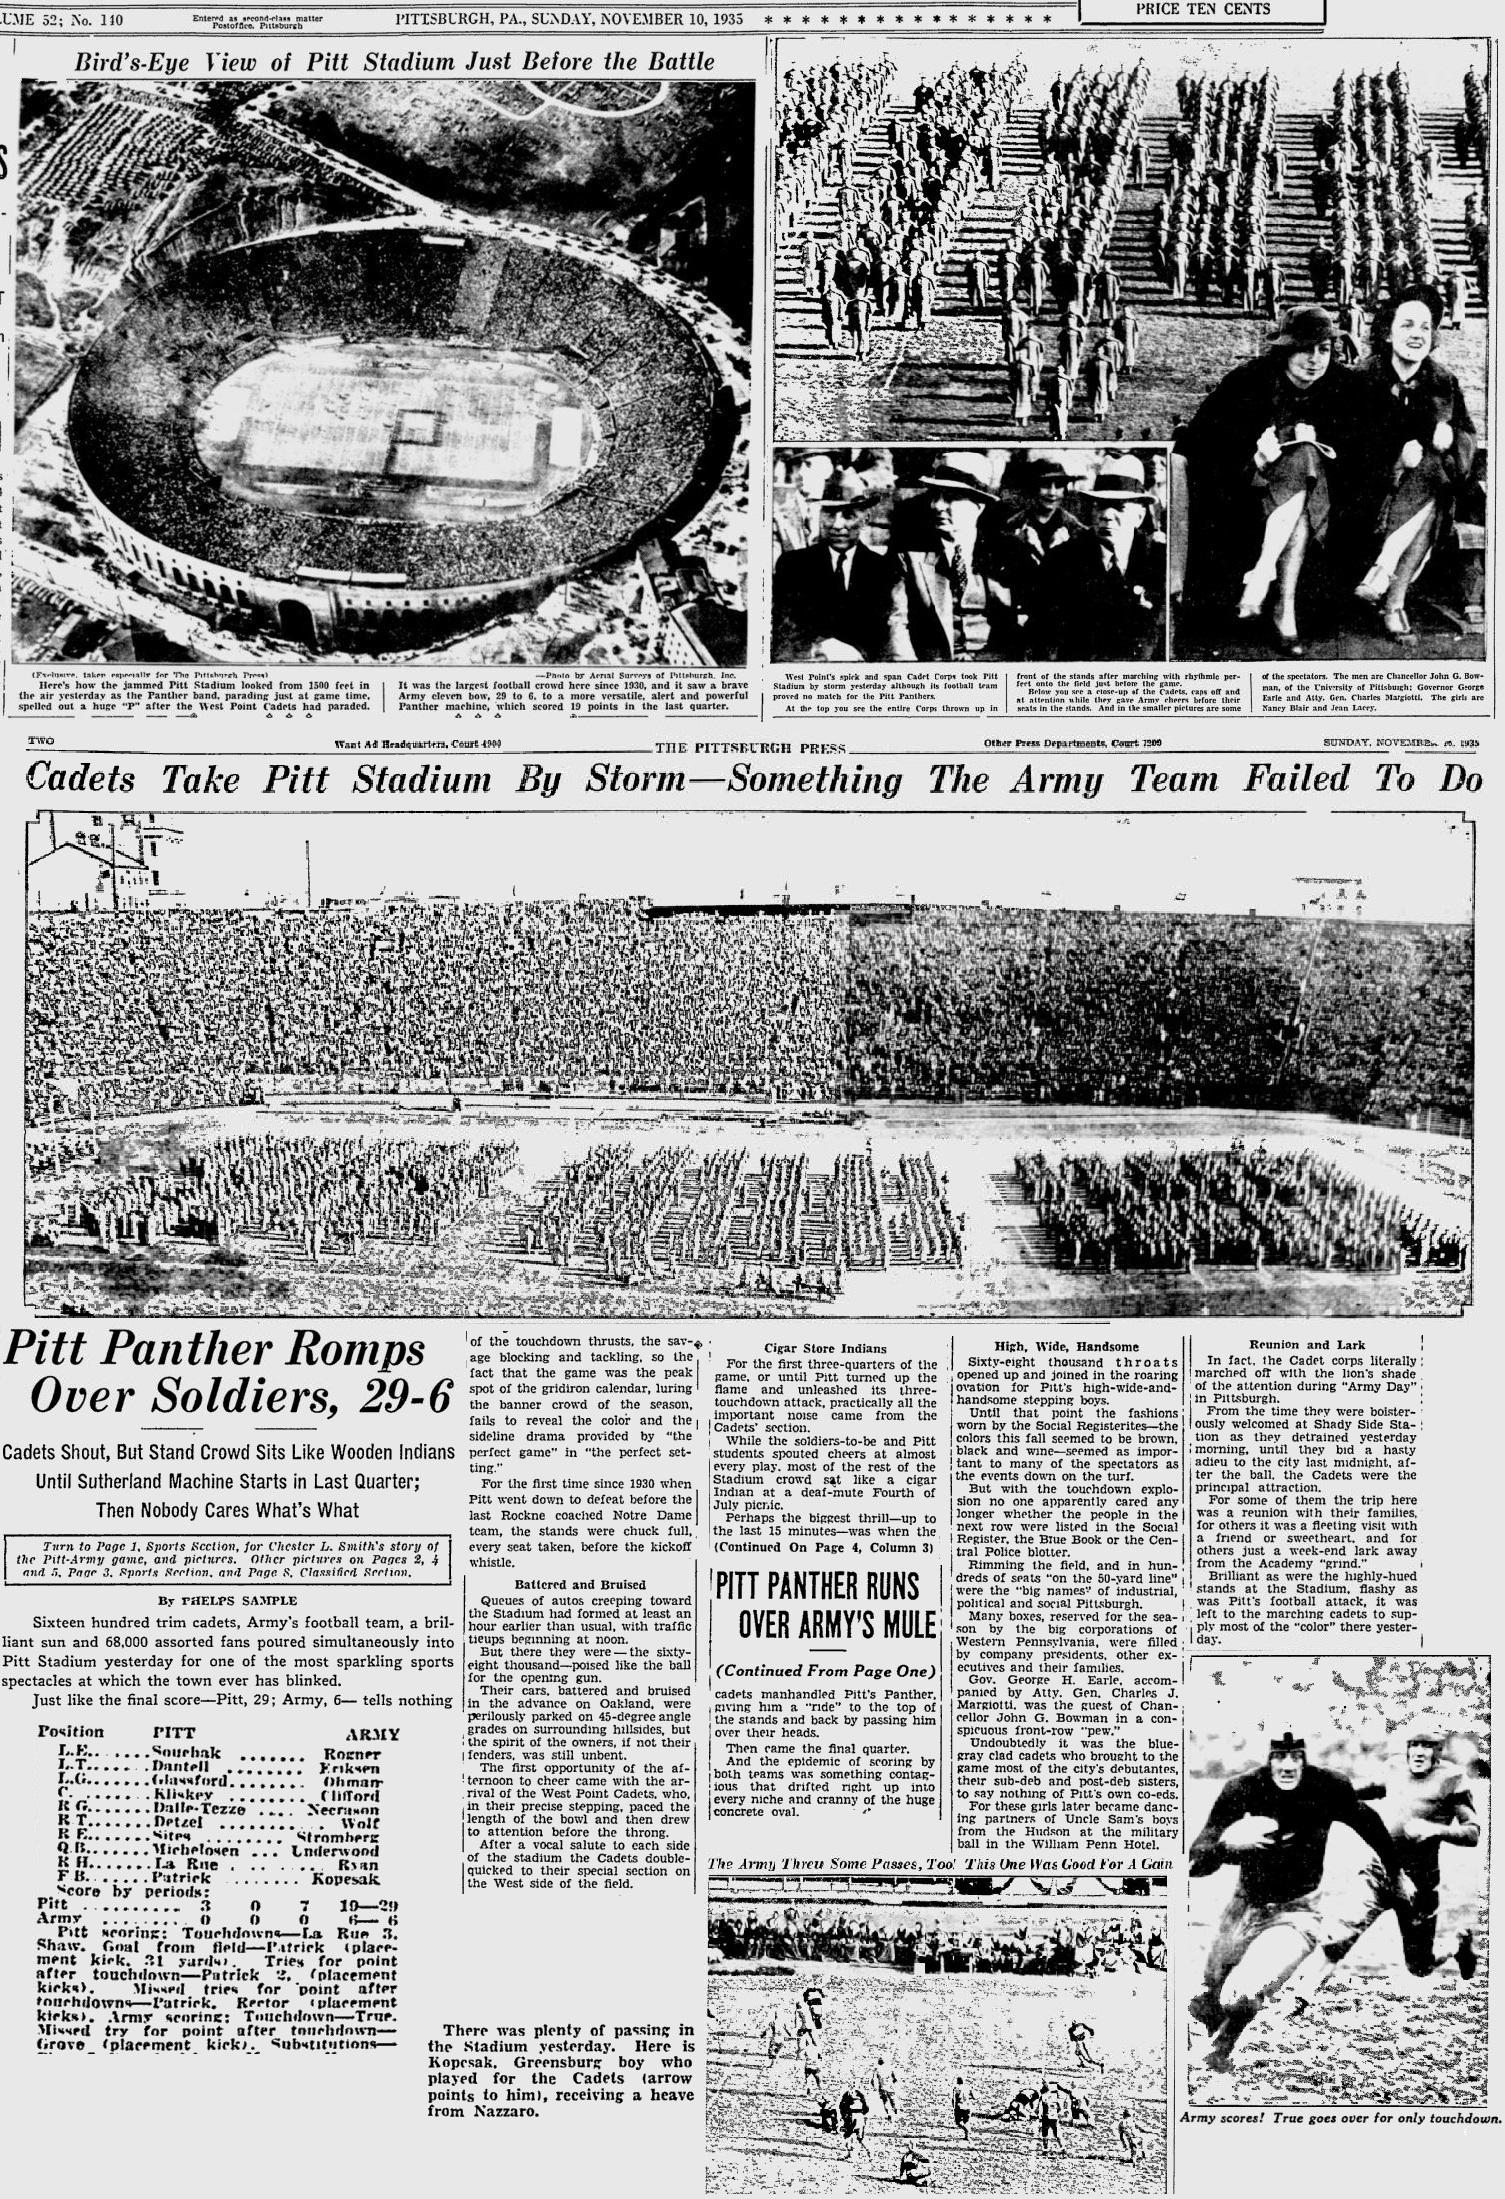 ArmyFB_1935_vsPitt_Stadium-CorpsofCadets_PittsburghPress_Oct161932